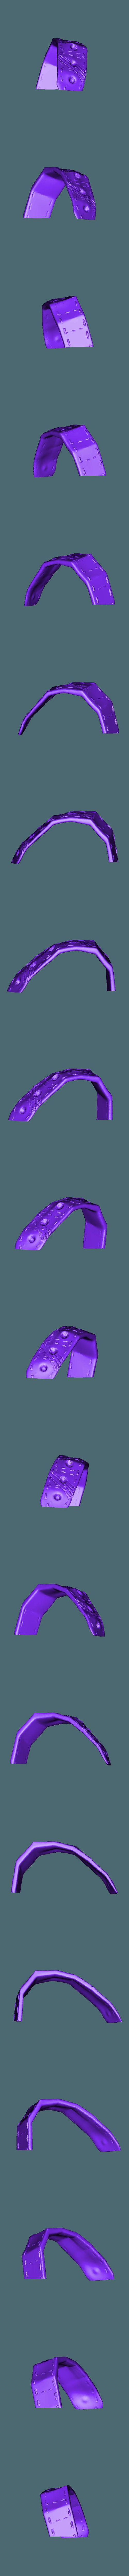 BUSTO REPTIL PART 2.stl Download free STL file lizar warrior bust. • 3D printer object, neoneknk